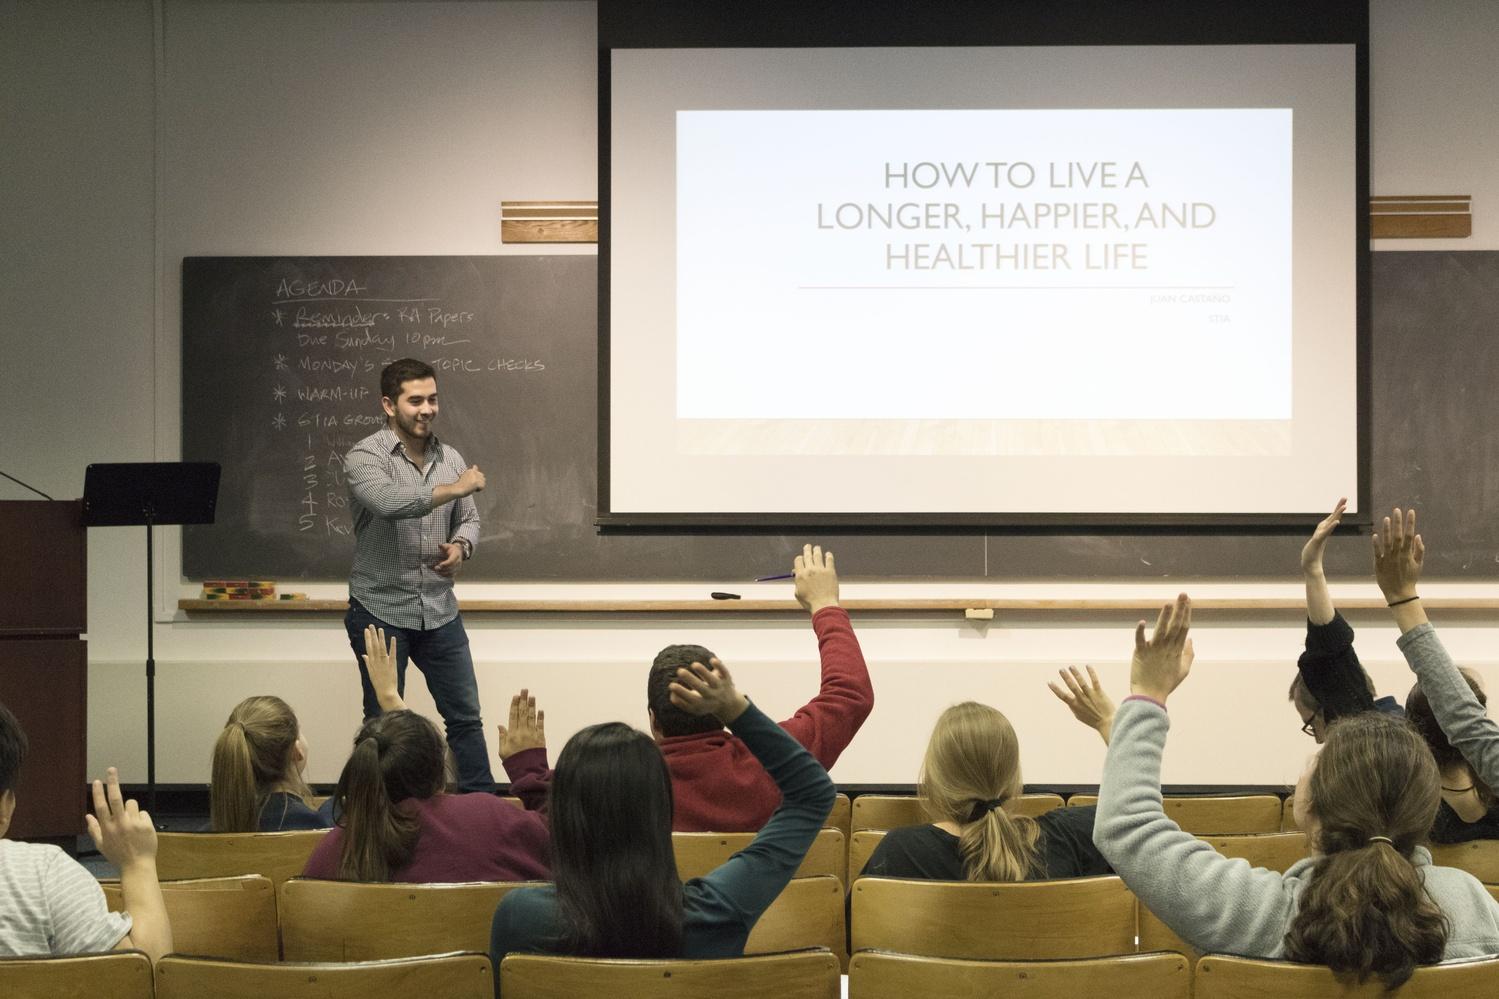 Juan P. Castaño '17 presents a speech on happiness as part of Expos 40, a public speaking class.